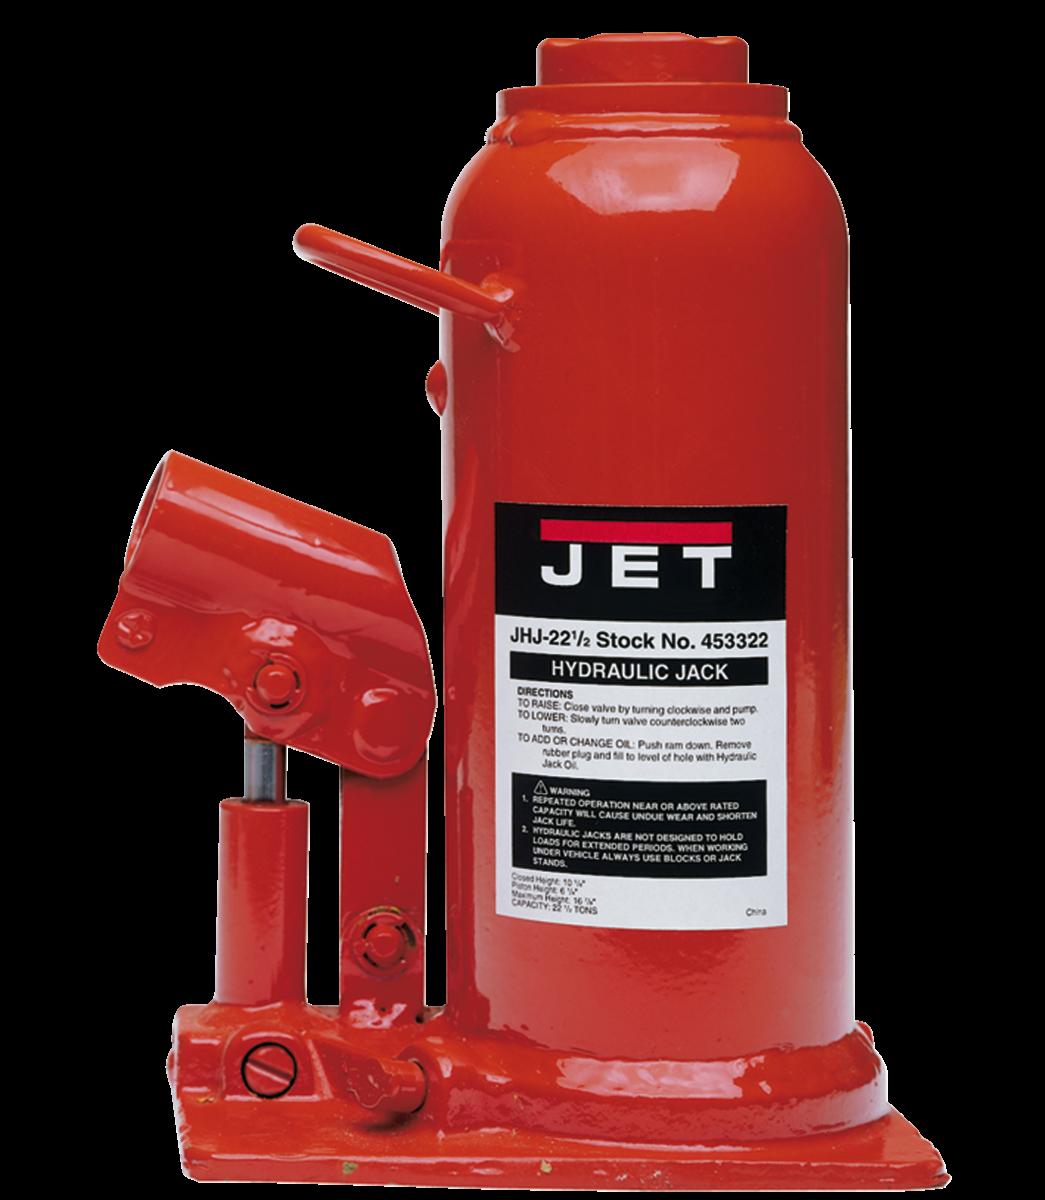 JHJ-22-1/2, 22-1/2-Ton Hydraulic Bottle Jack